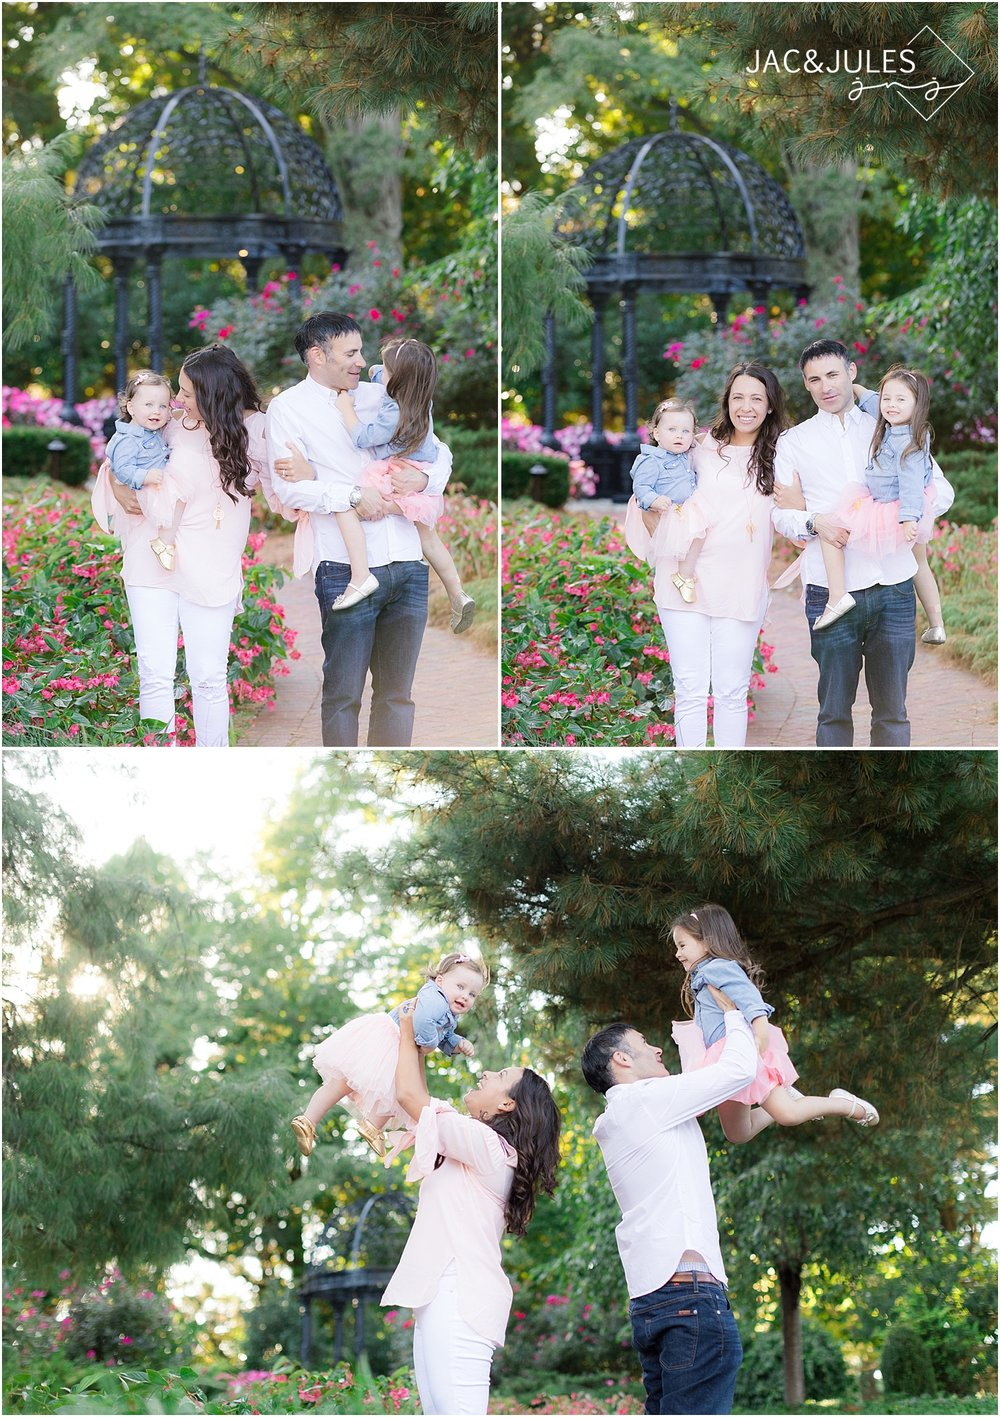 jacnjules photographs family at ashford estate wedding venue